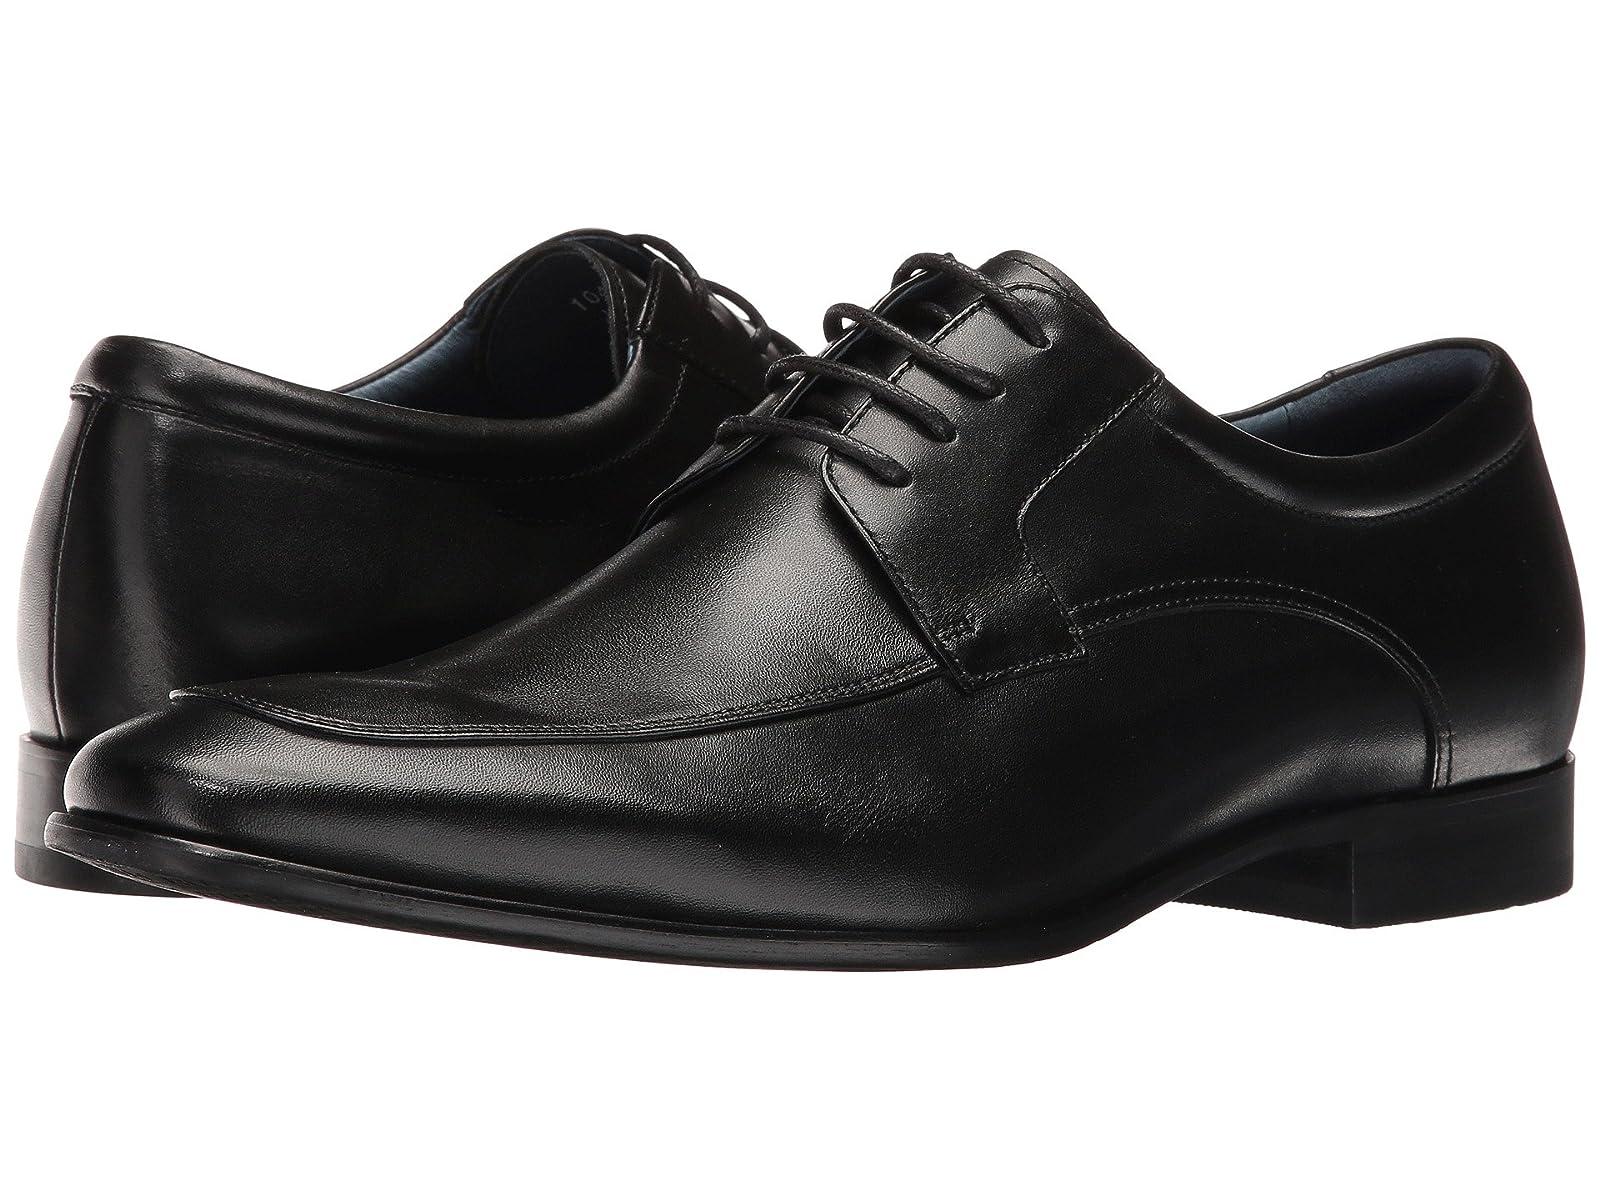 RUSH by Gordon Rush NielsonCheap and distinctive eye-catching shoes